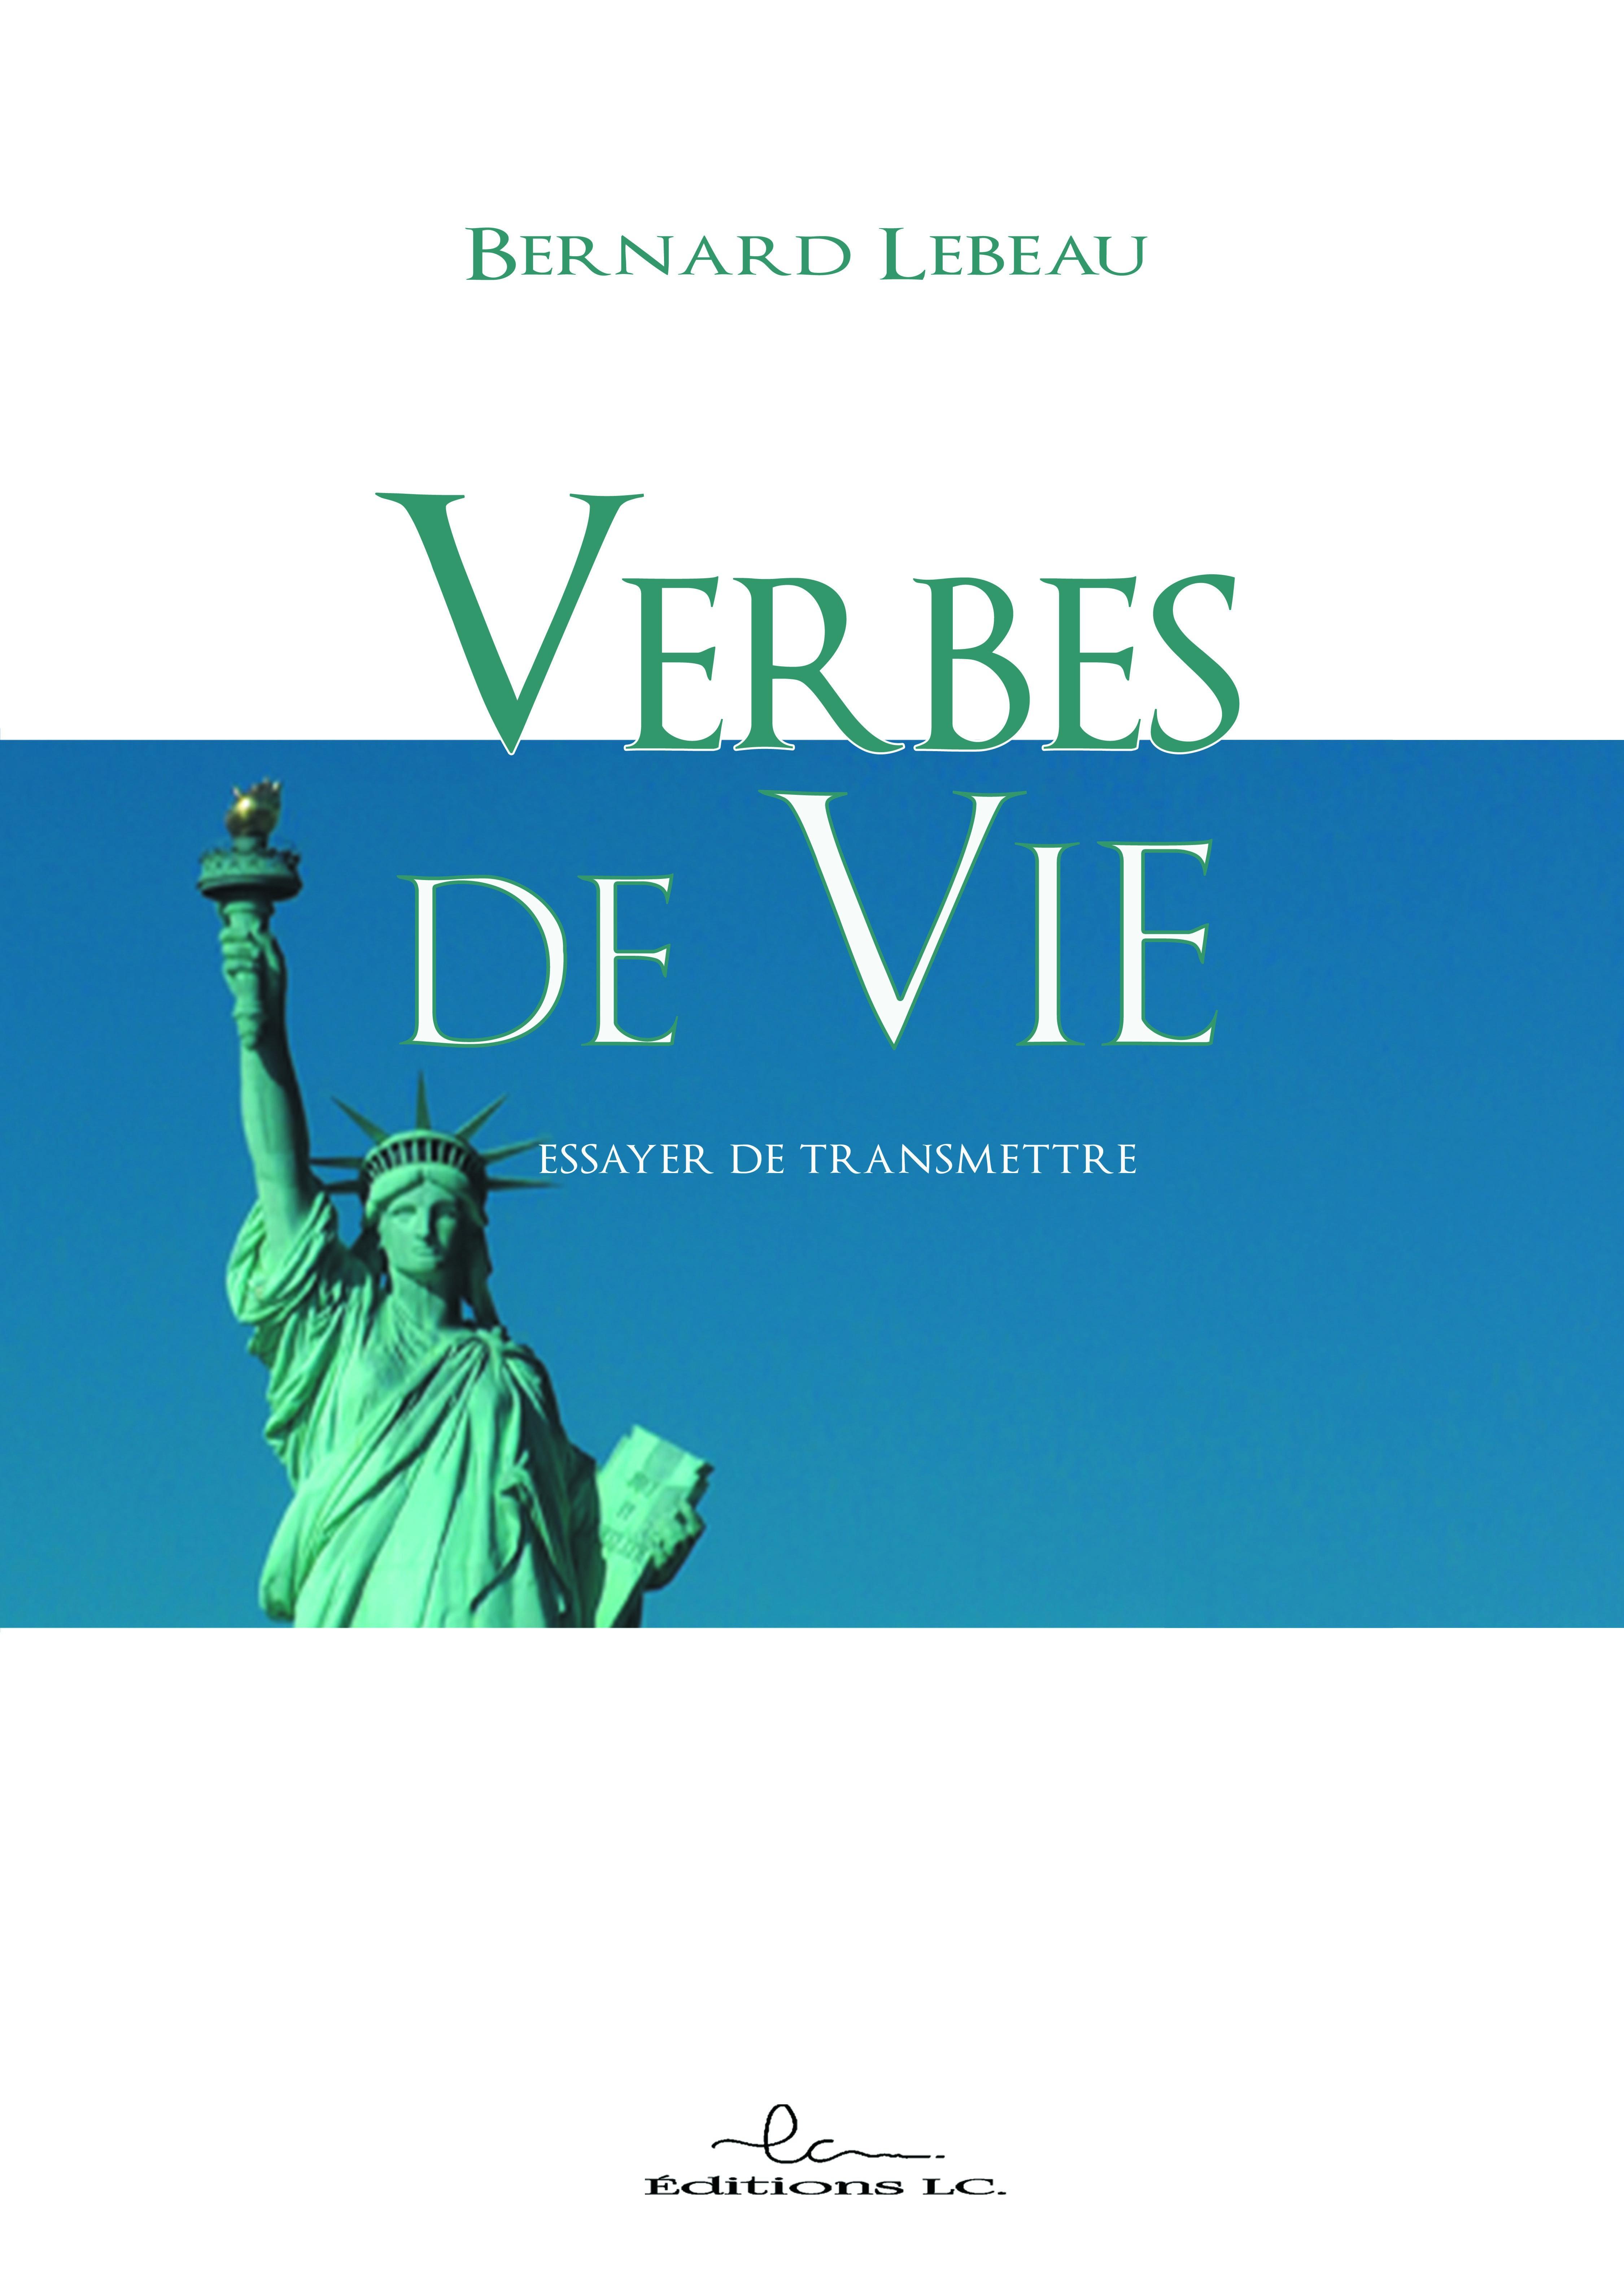 Verbes De Vie Bernard Lebeau Editions Lc Ebook Pdf Librairies Autrement